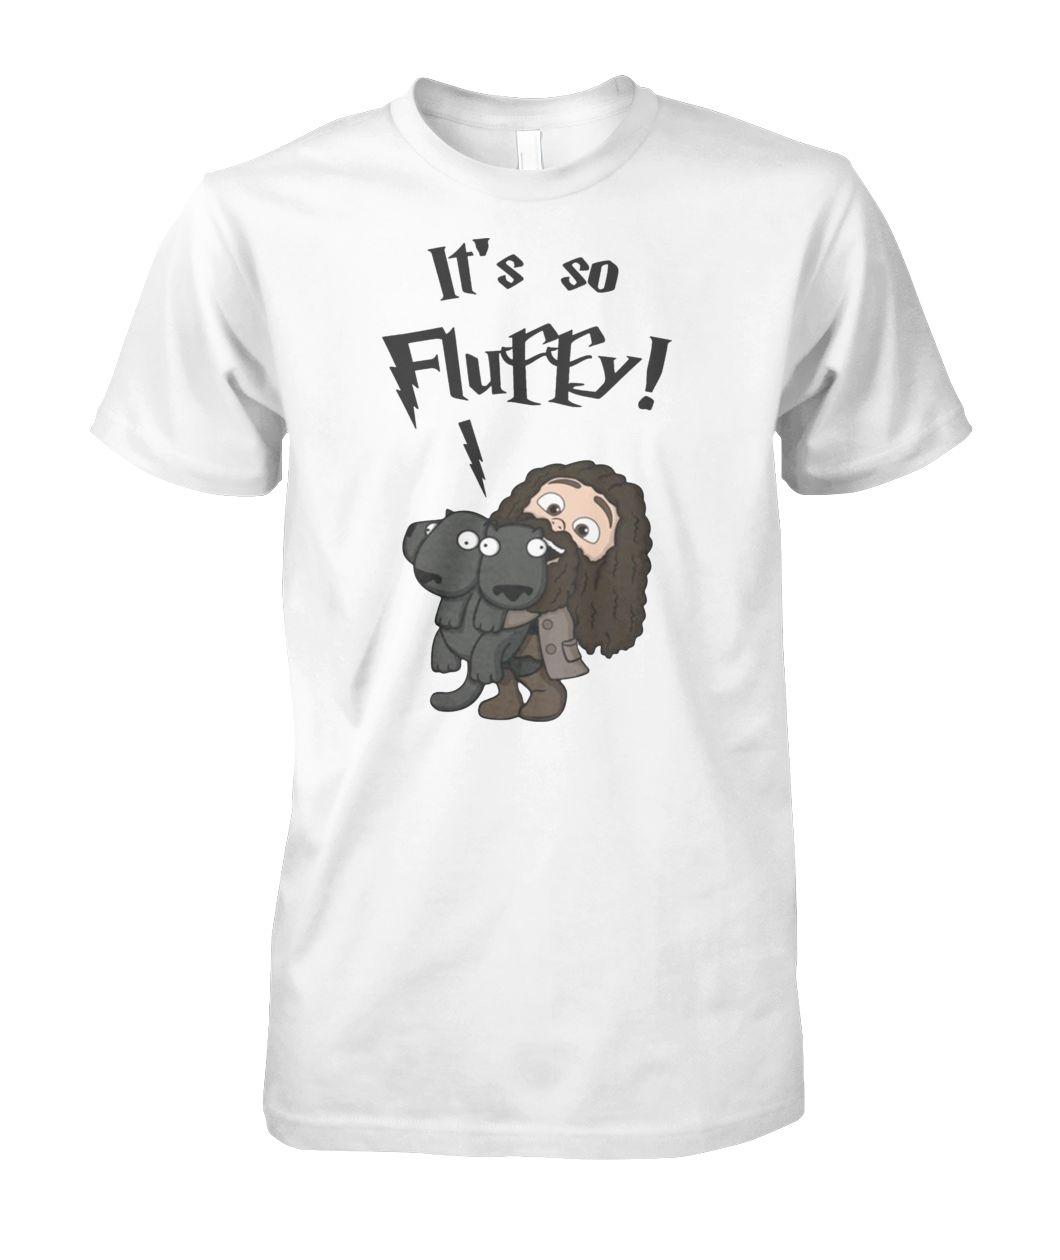 Harry potter rubeus hagrid it's so fluffy shirt